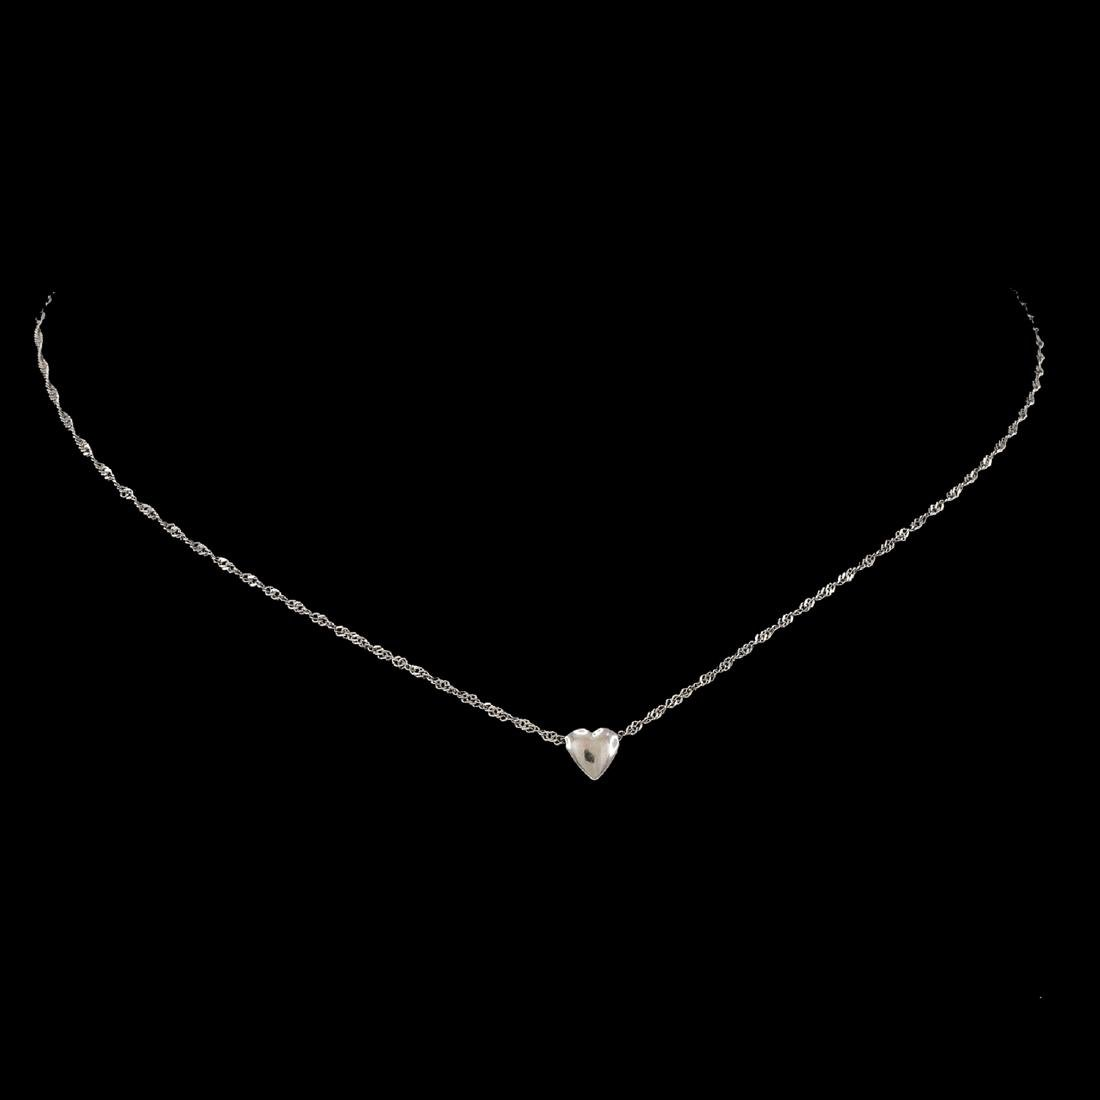 *Fine Jewelry 14 KT White Gold Singapore W Puffed Heart